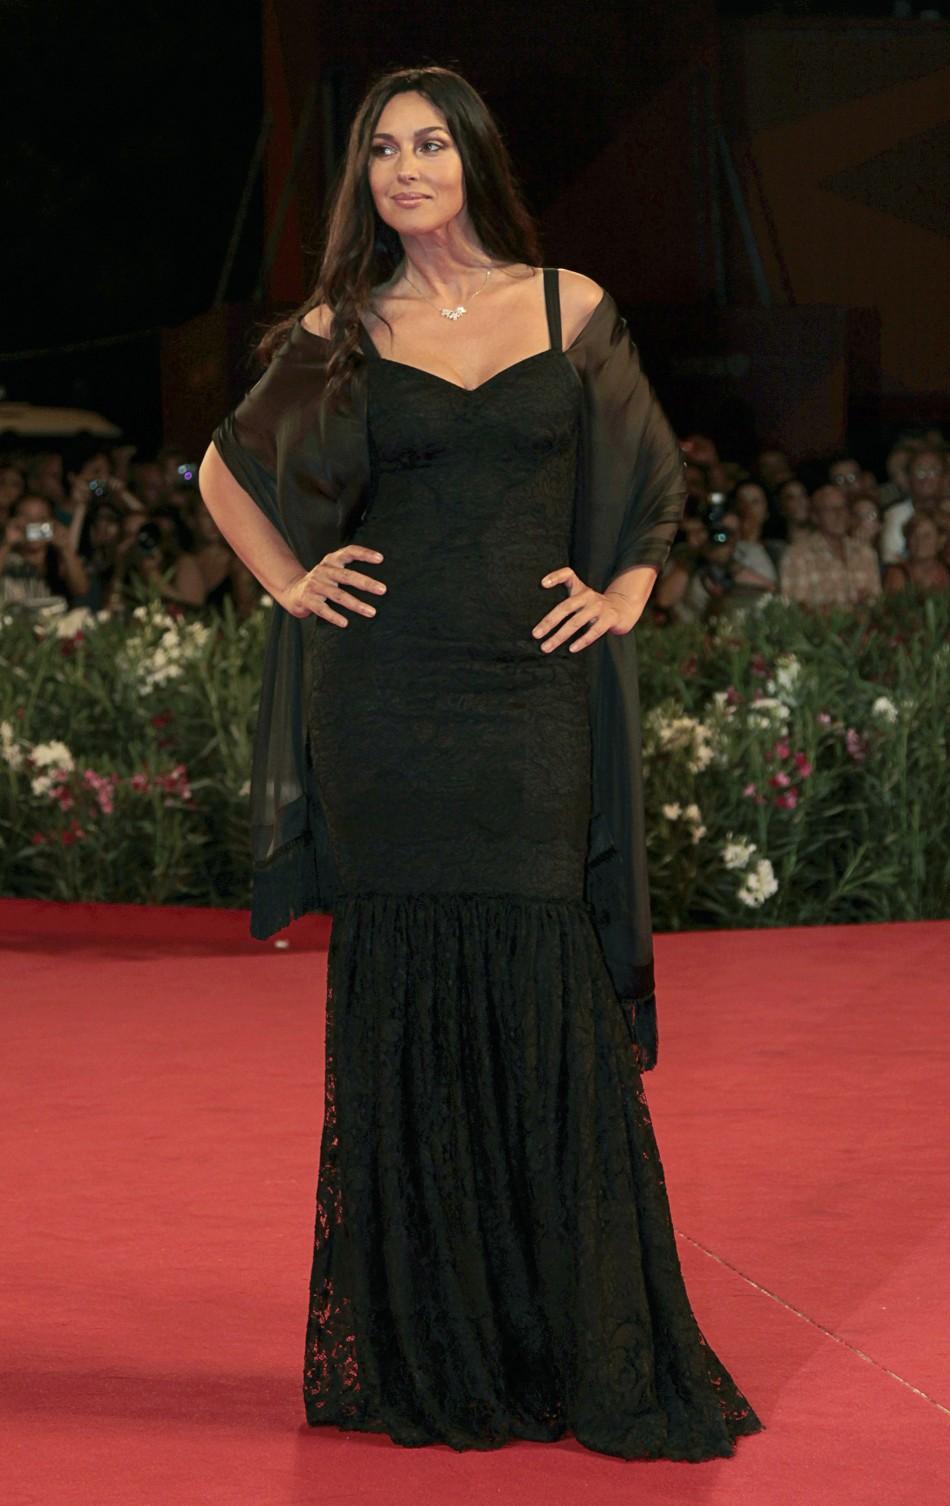 7. Monica Belucci